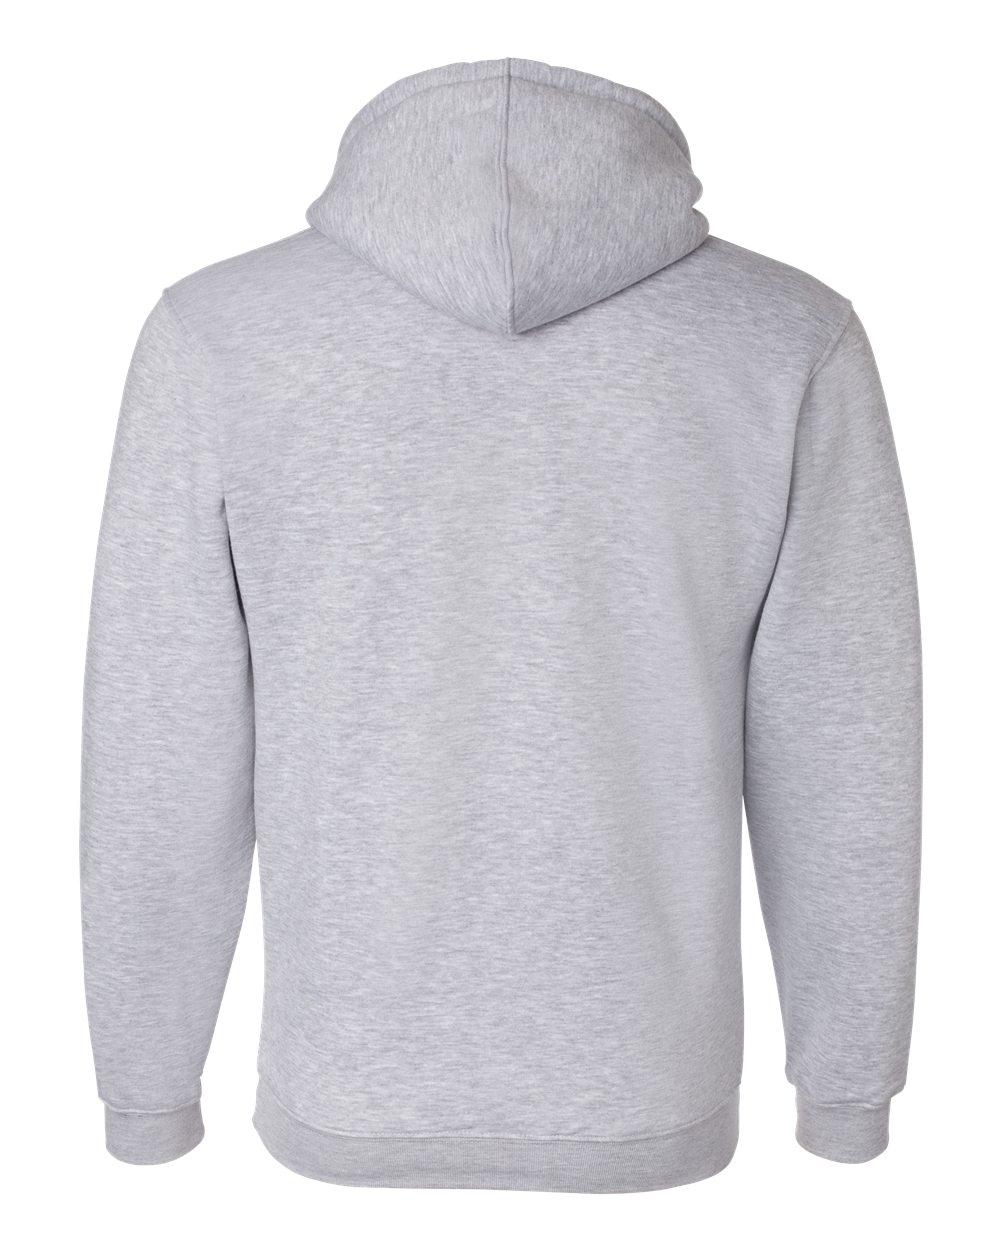 Bayside-Mens-Blank-USA-Made-Hooded-Sweatshirt-960-up-to-6XL miniature 16